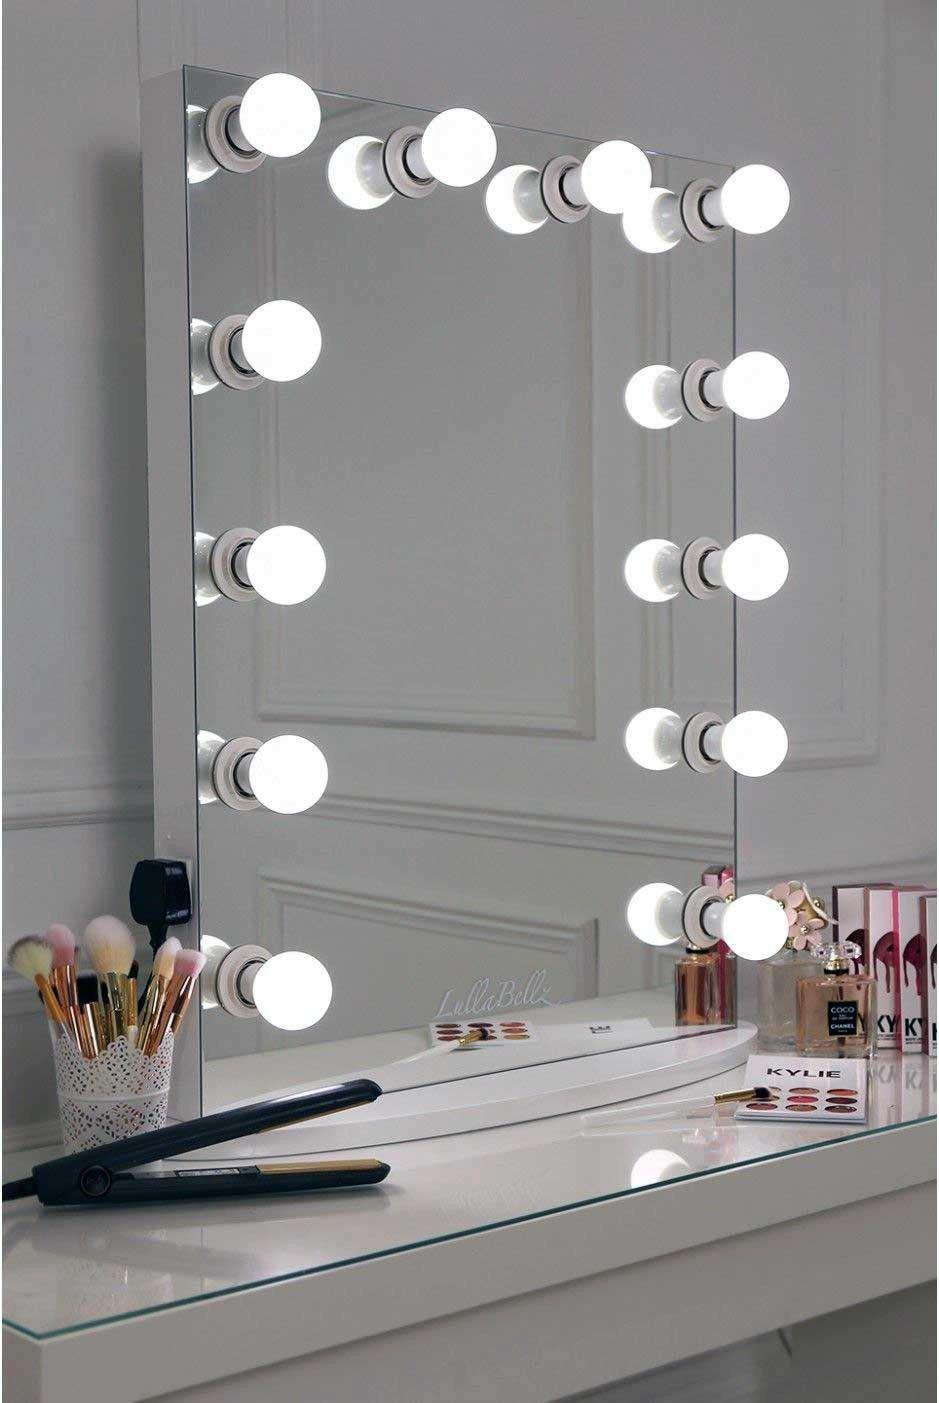 Mirrors for Bedroom Walls Beautiful 35 Stunning Apartment Bedroom Mirror Ideas